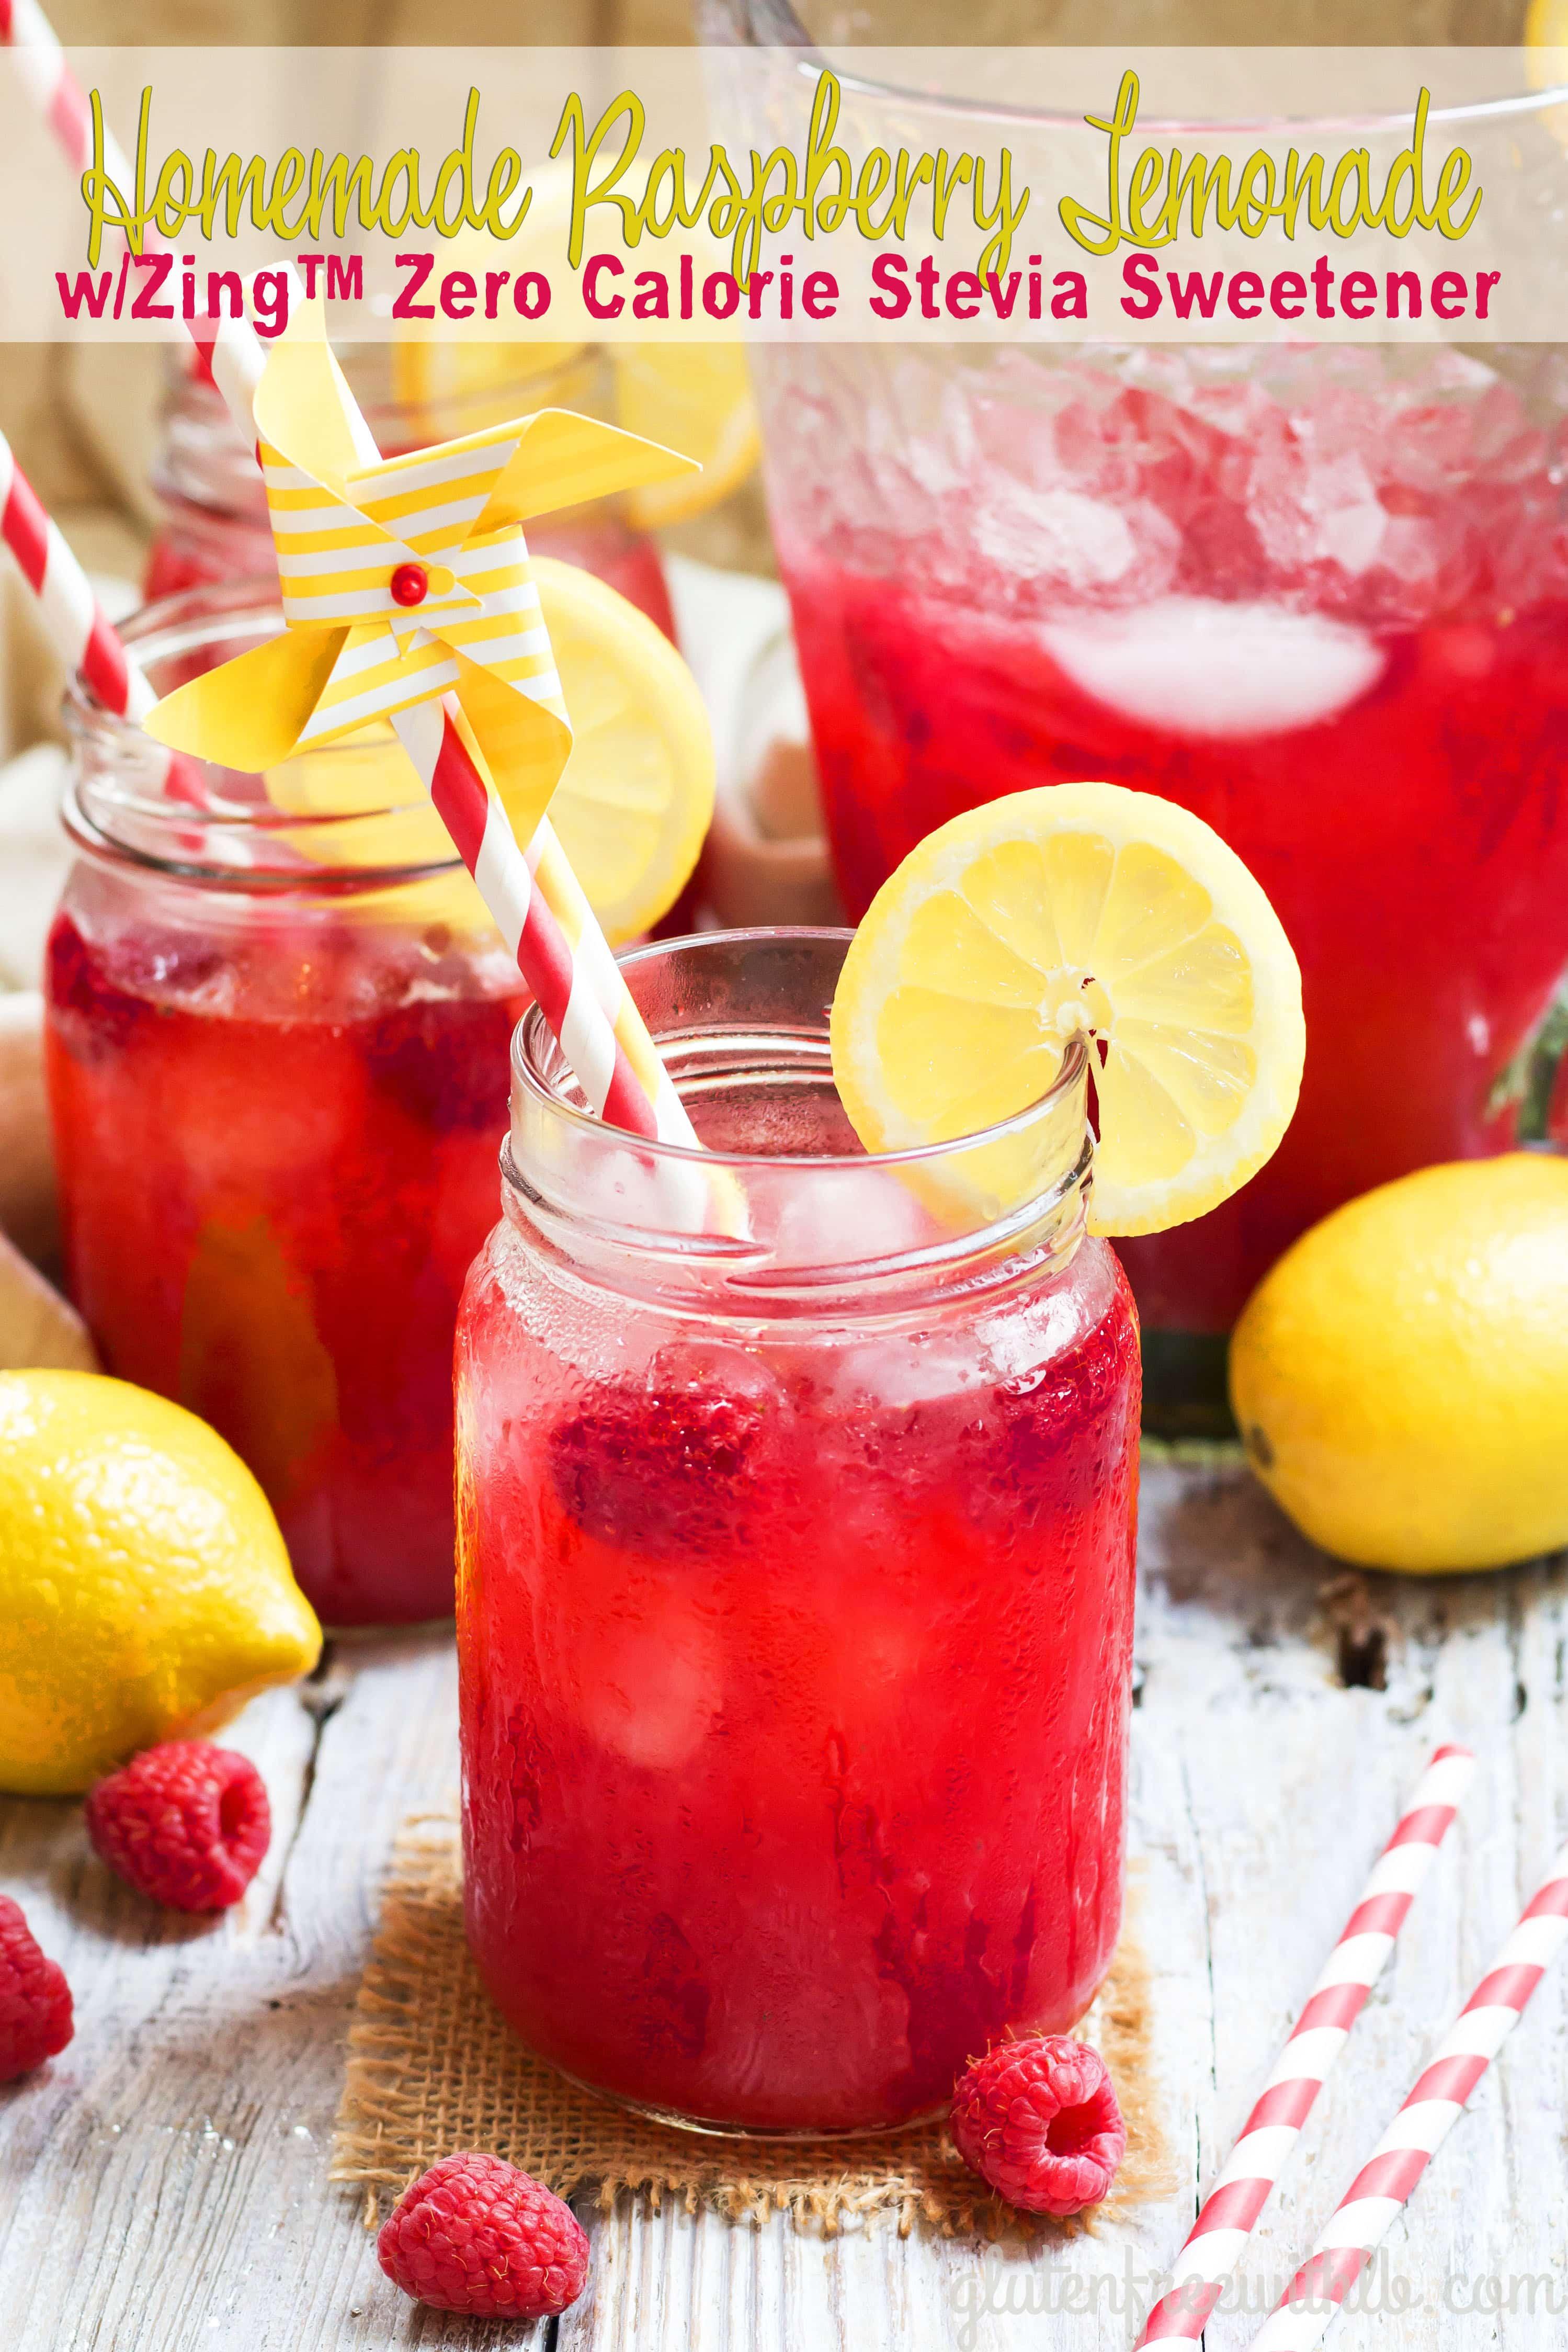 Homemade-Raspberry-Lemonade-ZING-Stevia-Sweetener-1